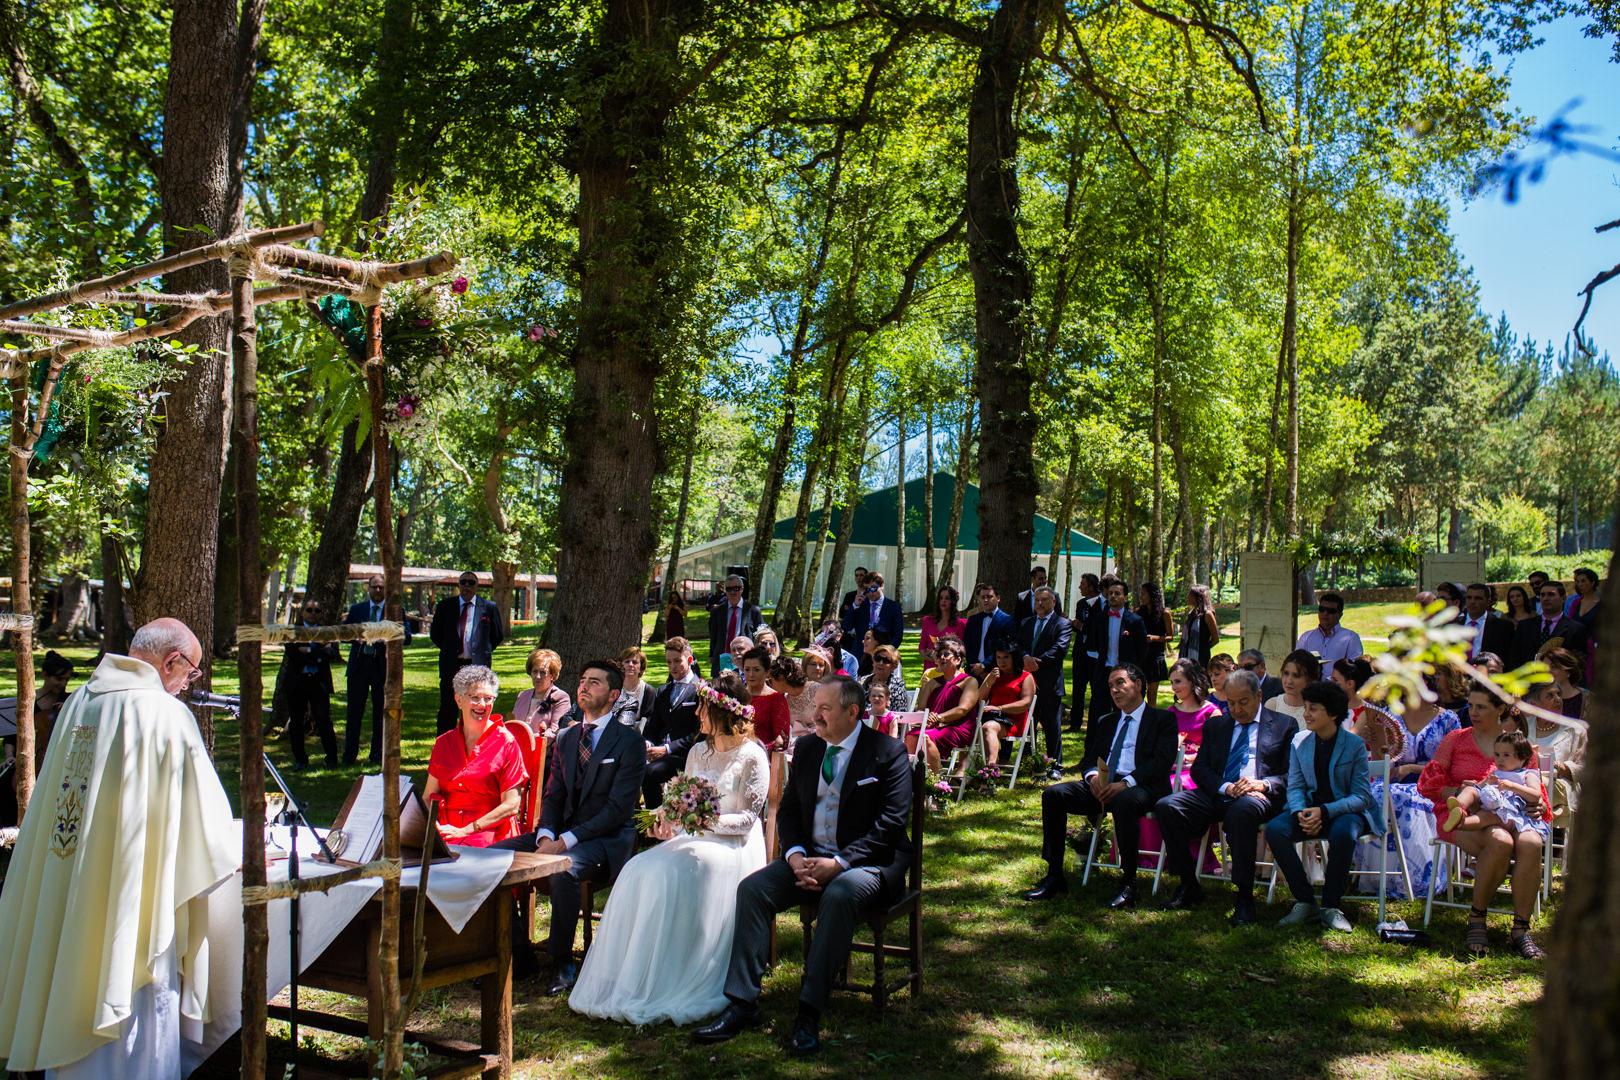 Boda-Lucia-Javi-Lugo-Rafael-Torres-fotografo-bodas-sevilla-madrid-barcelona-wedding-photographer--22.jpg